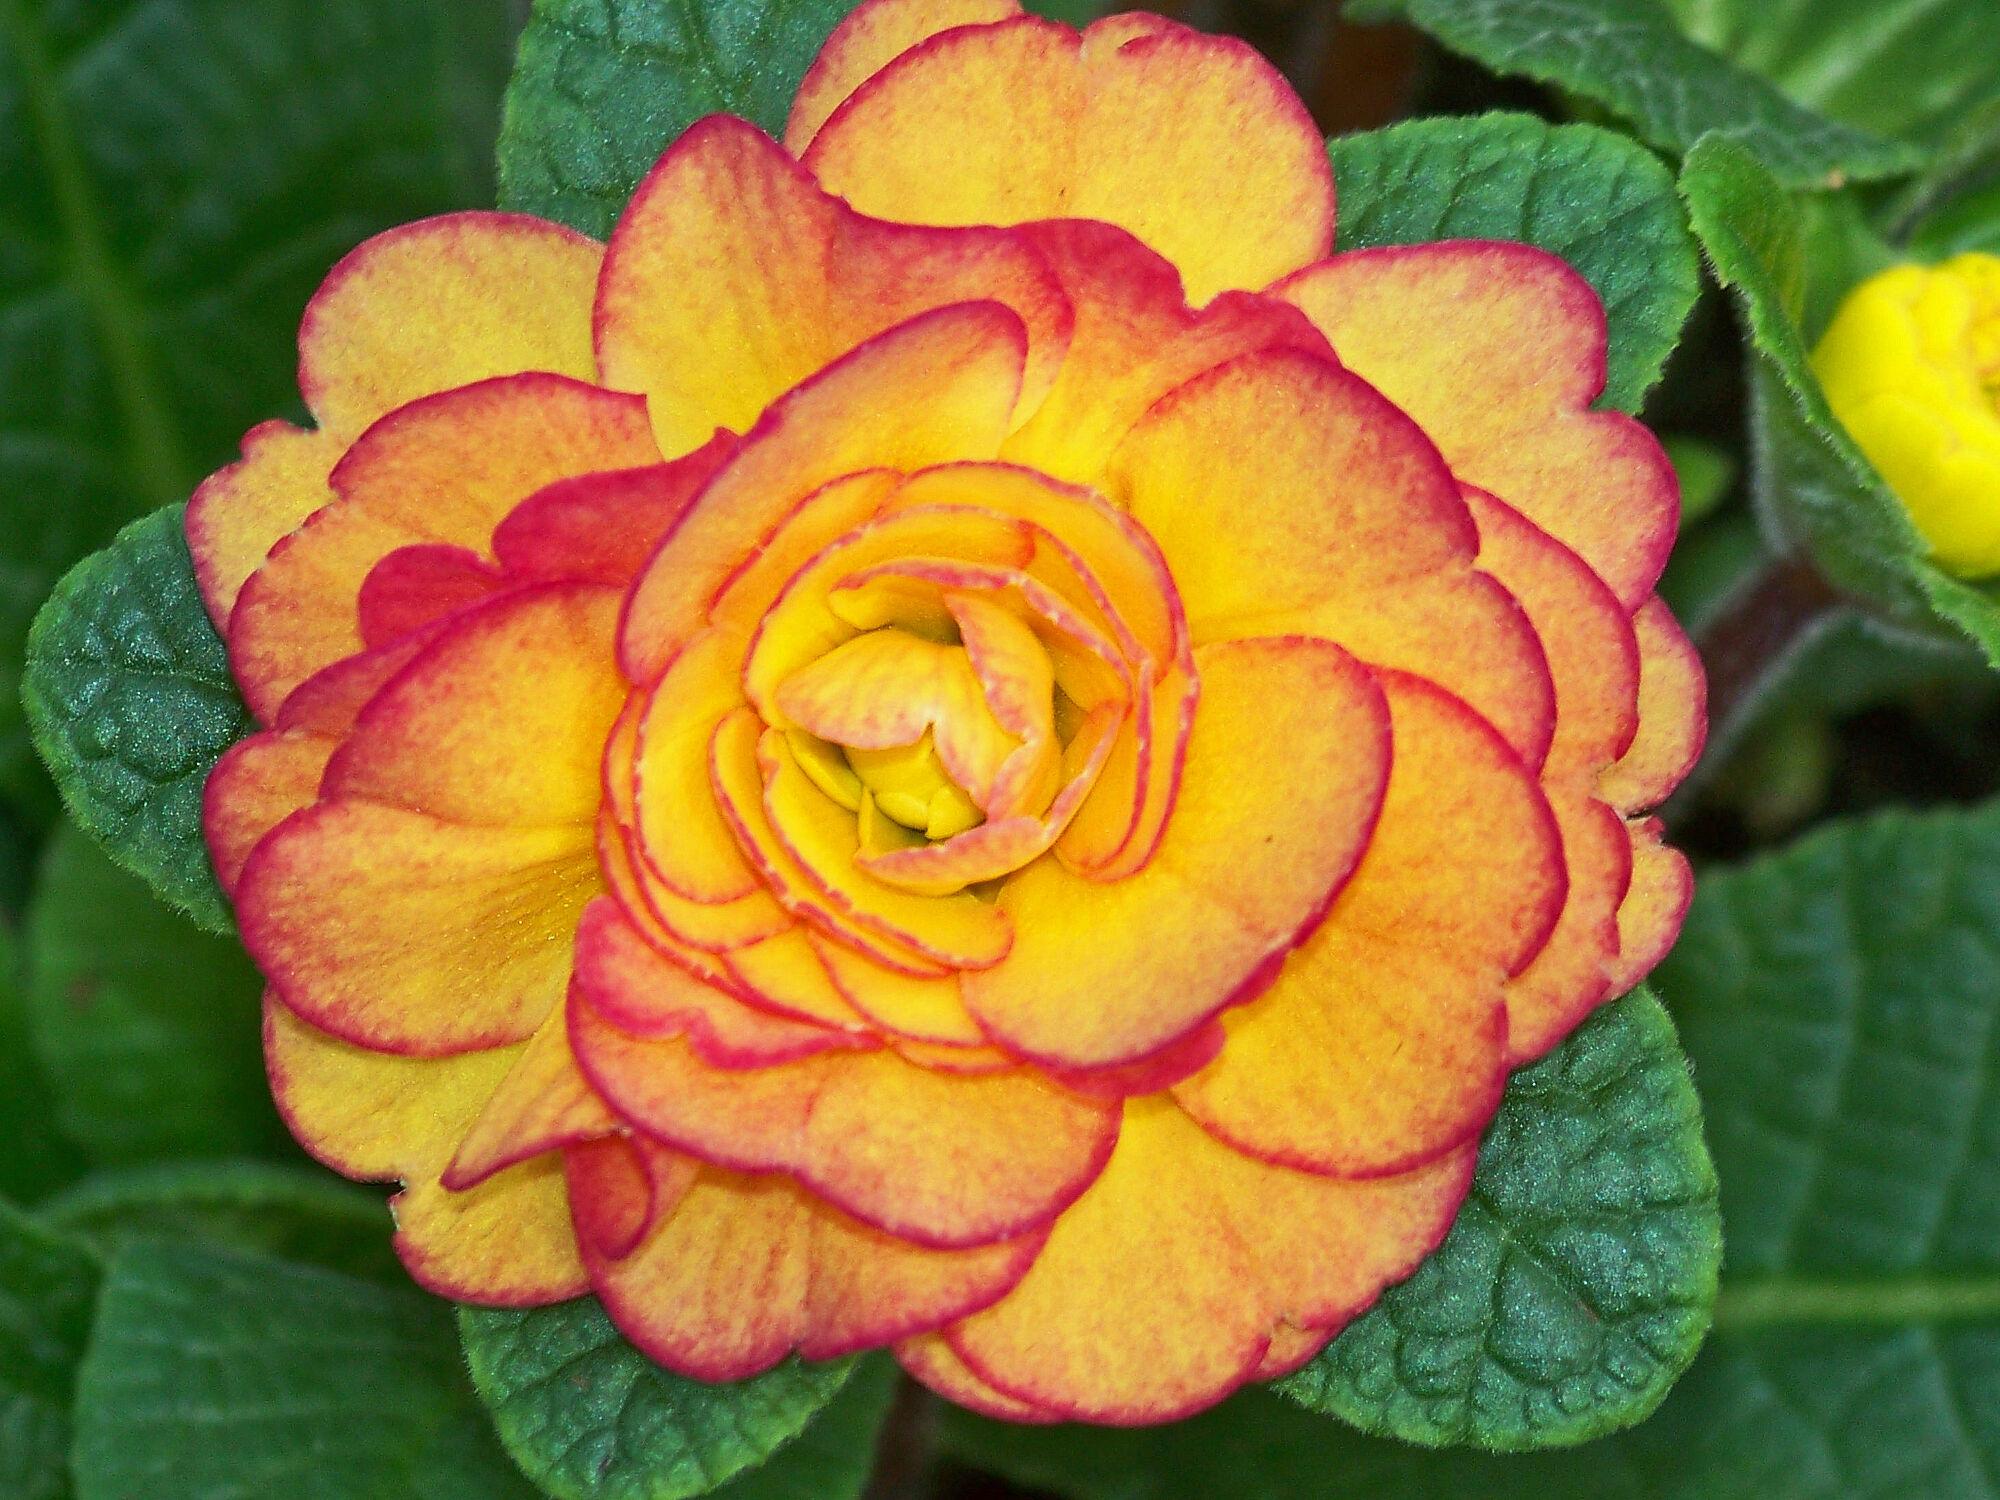 Bild mit frühlingsblumen